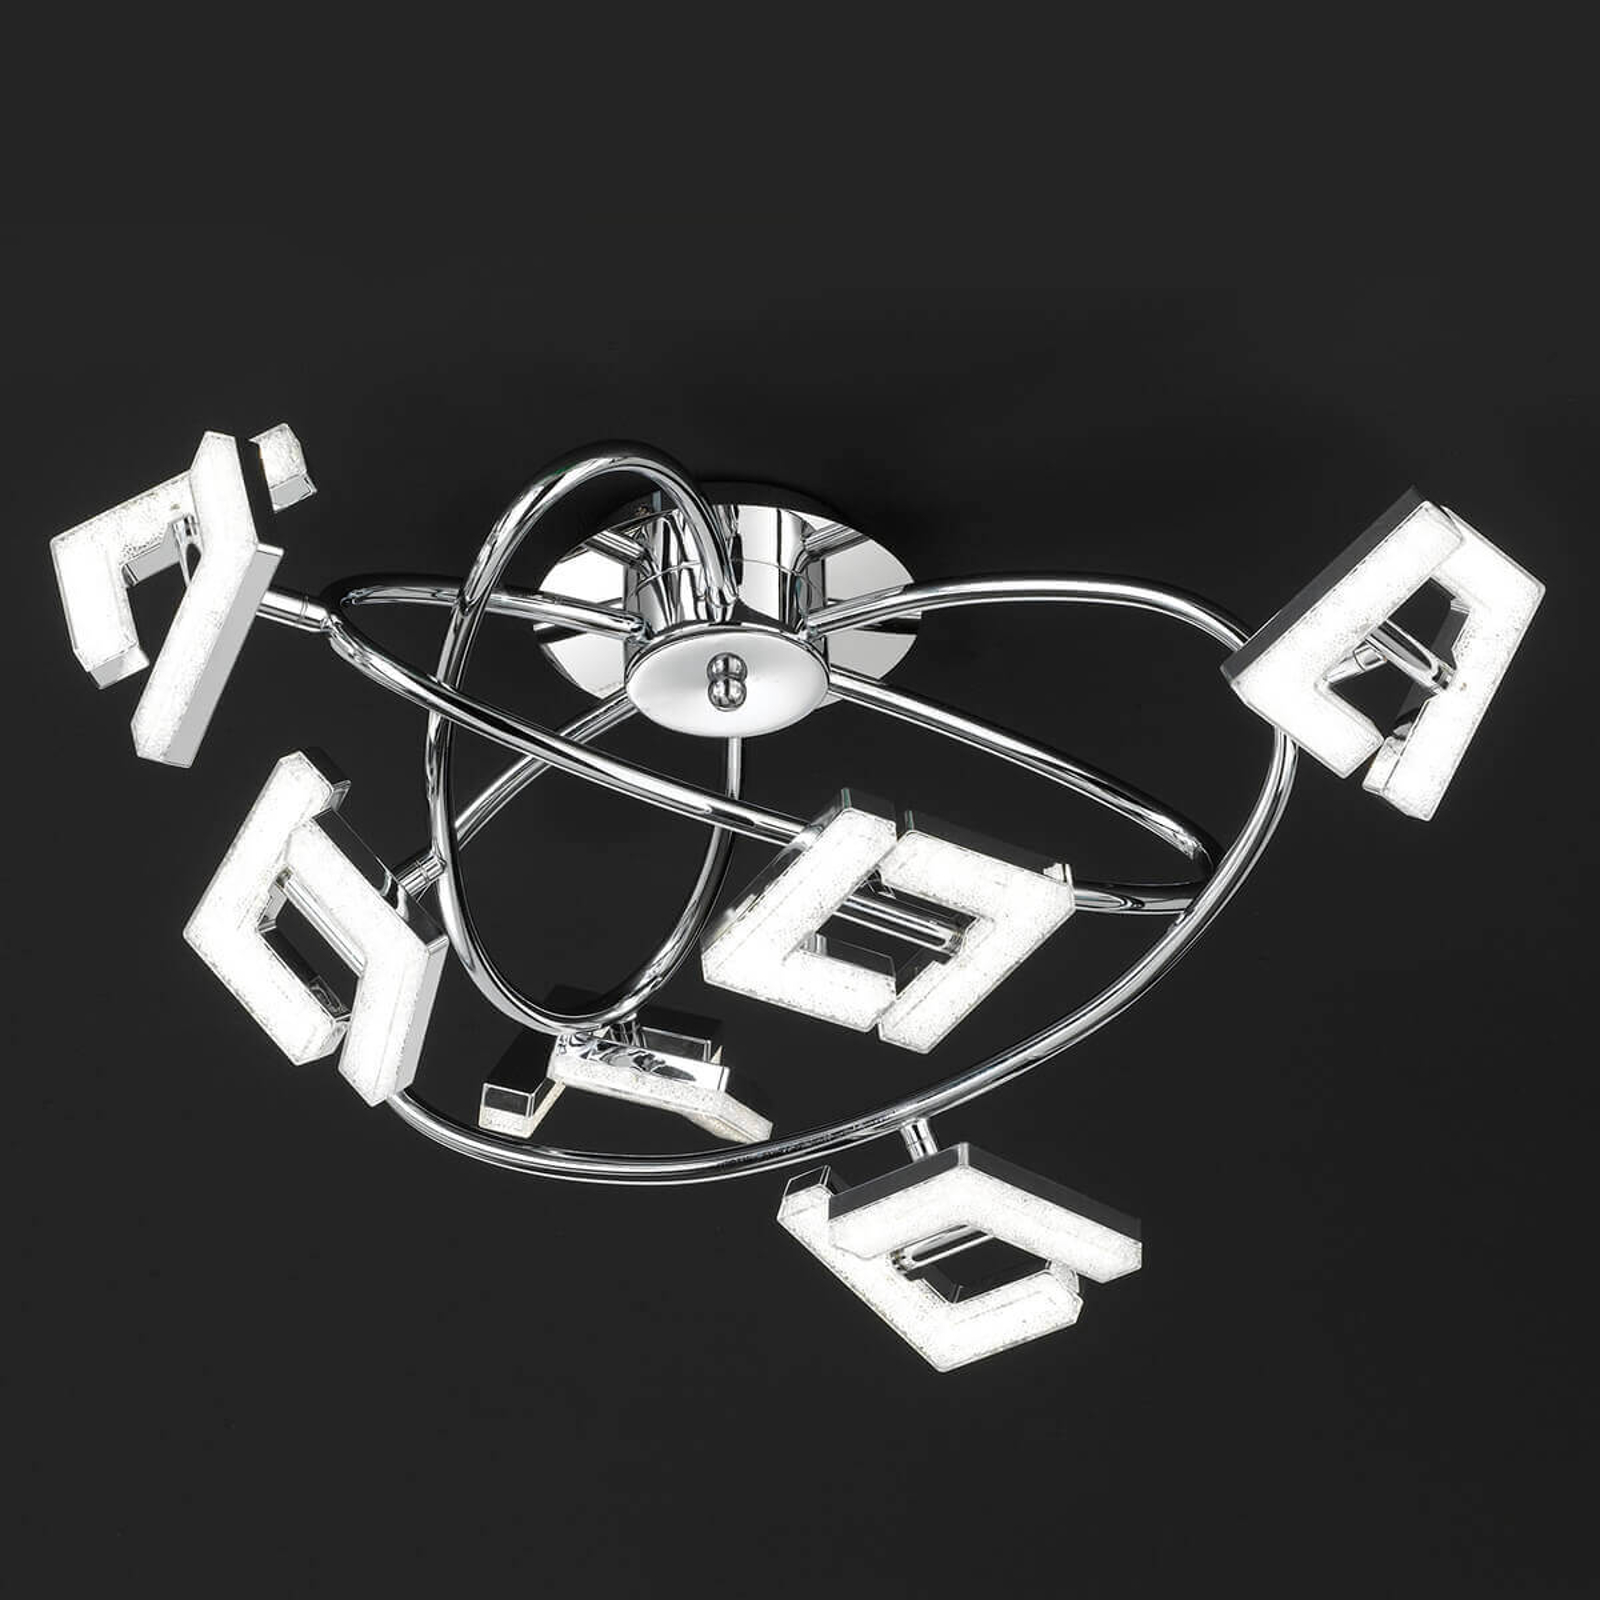 Topmoderne LED-Deckenleuchte Lea - 6-flammig